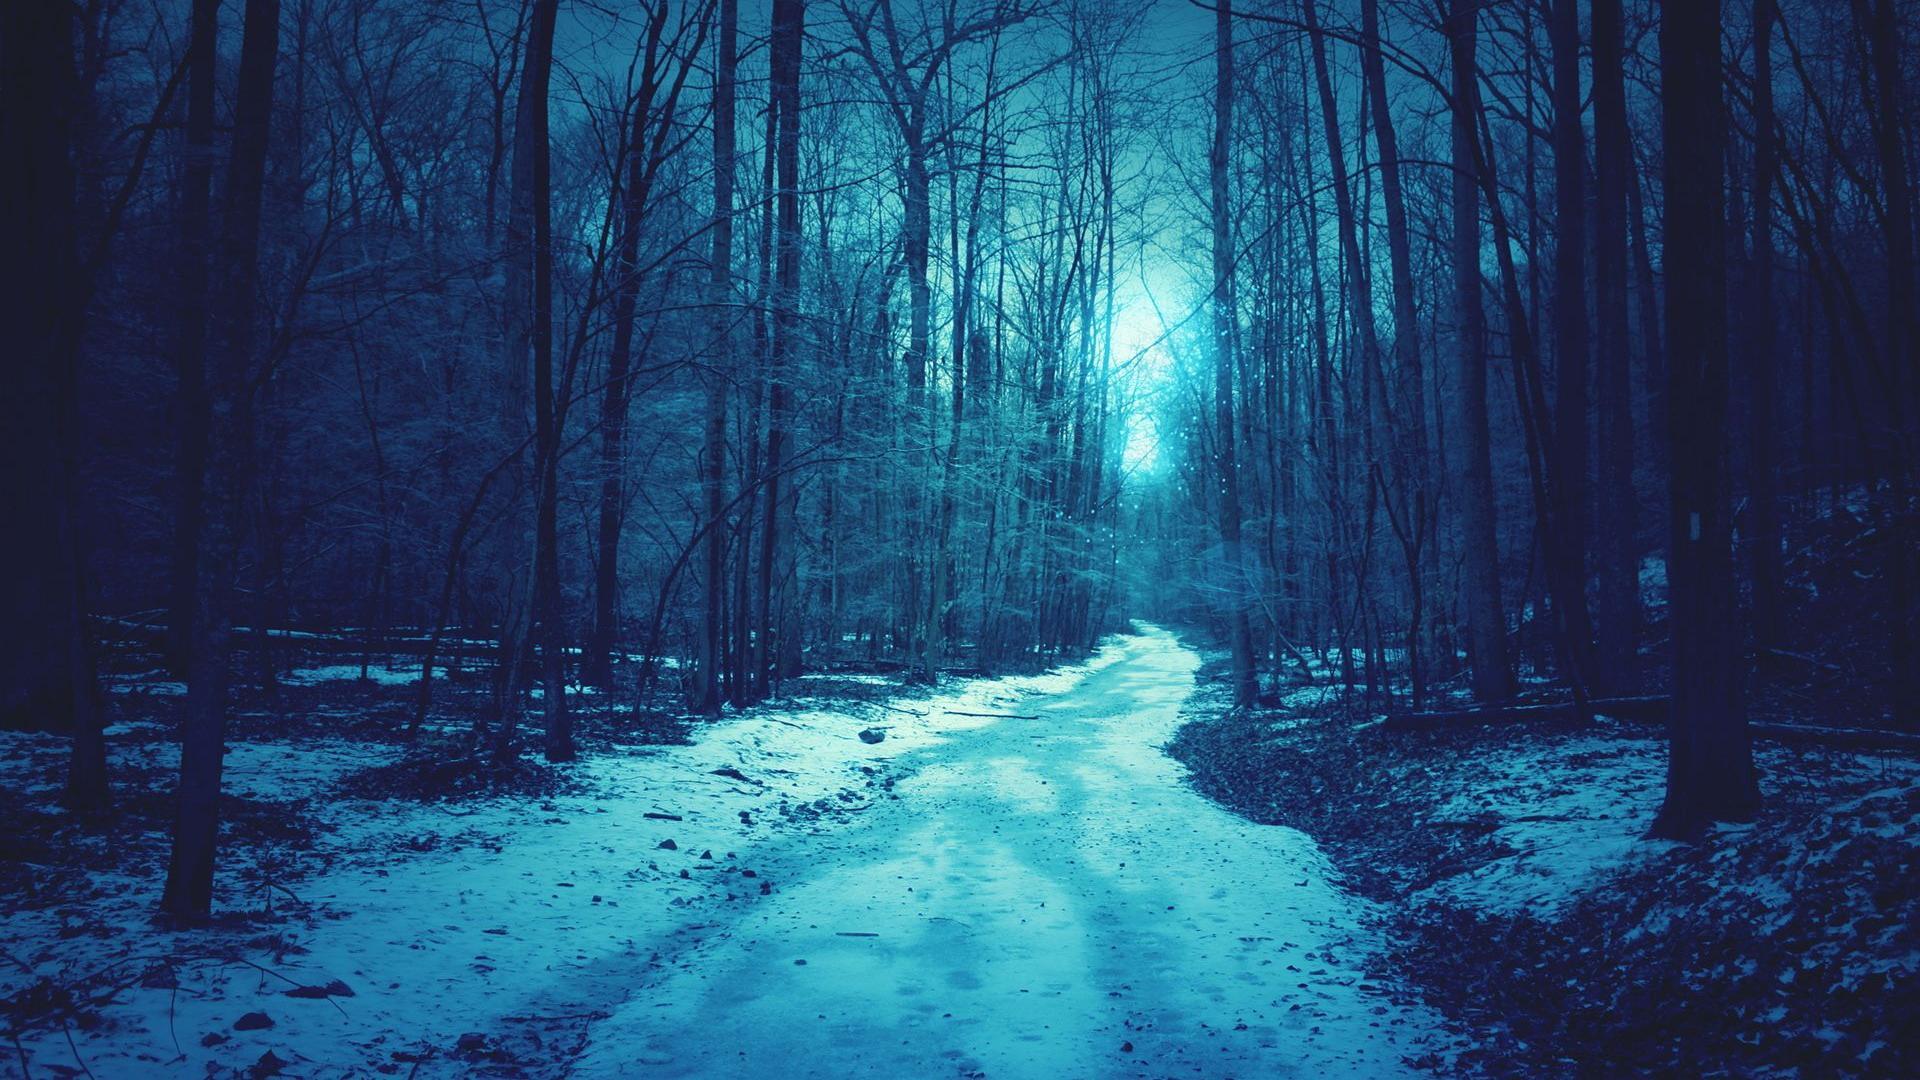 backgrounds winter shallow blue background forest snow desktop 1920x1080